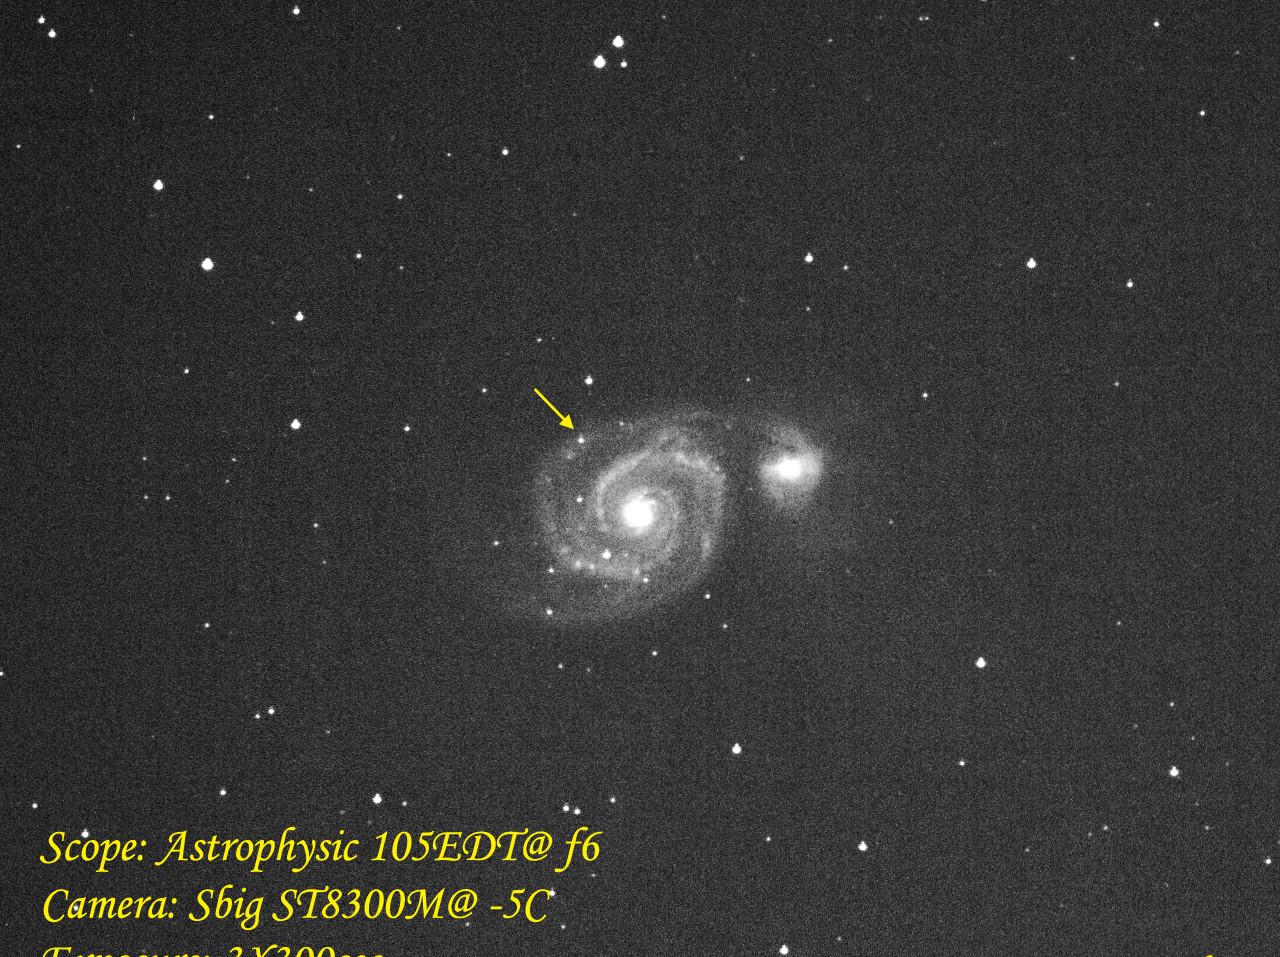 Supernova at M51